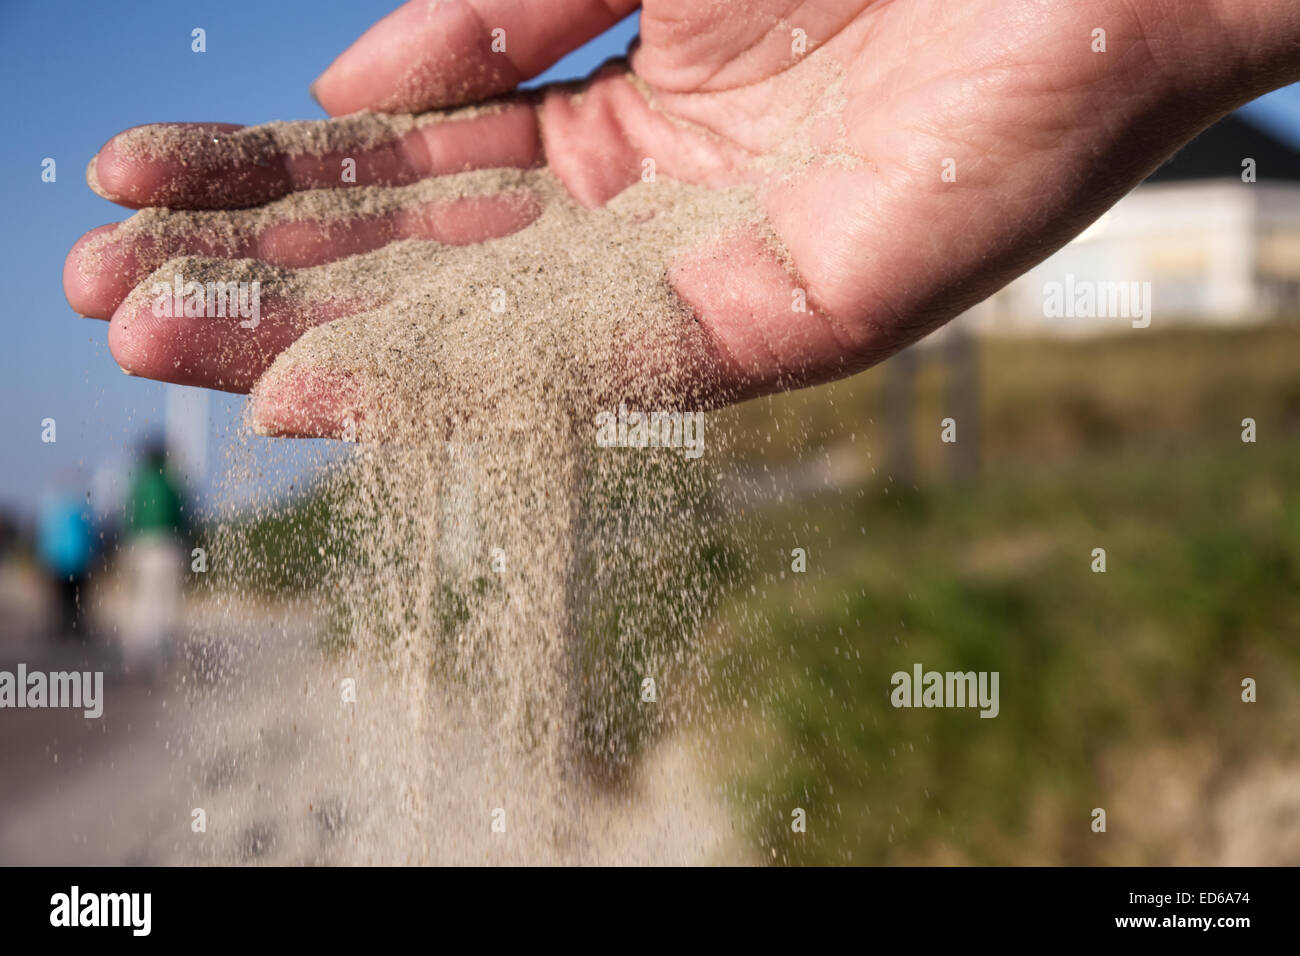 Sand running through hands on beach - Stock Image